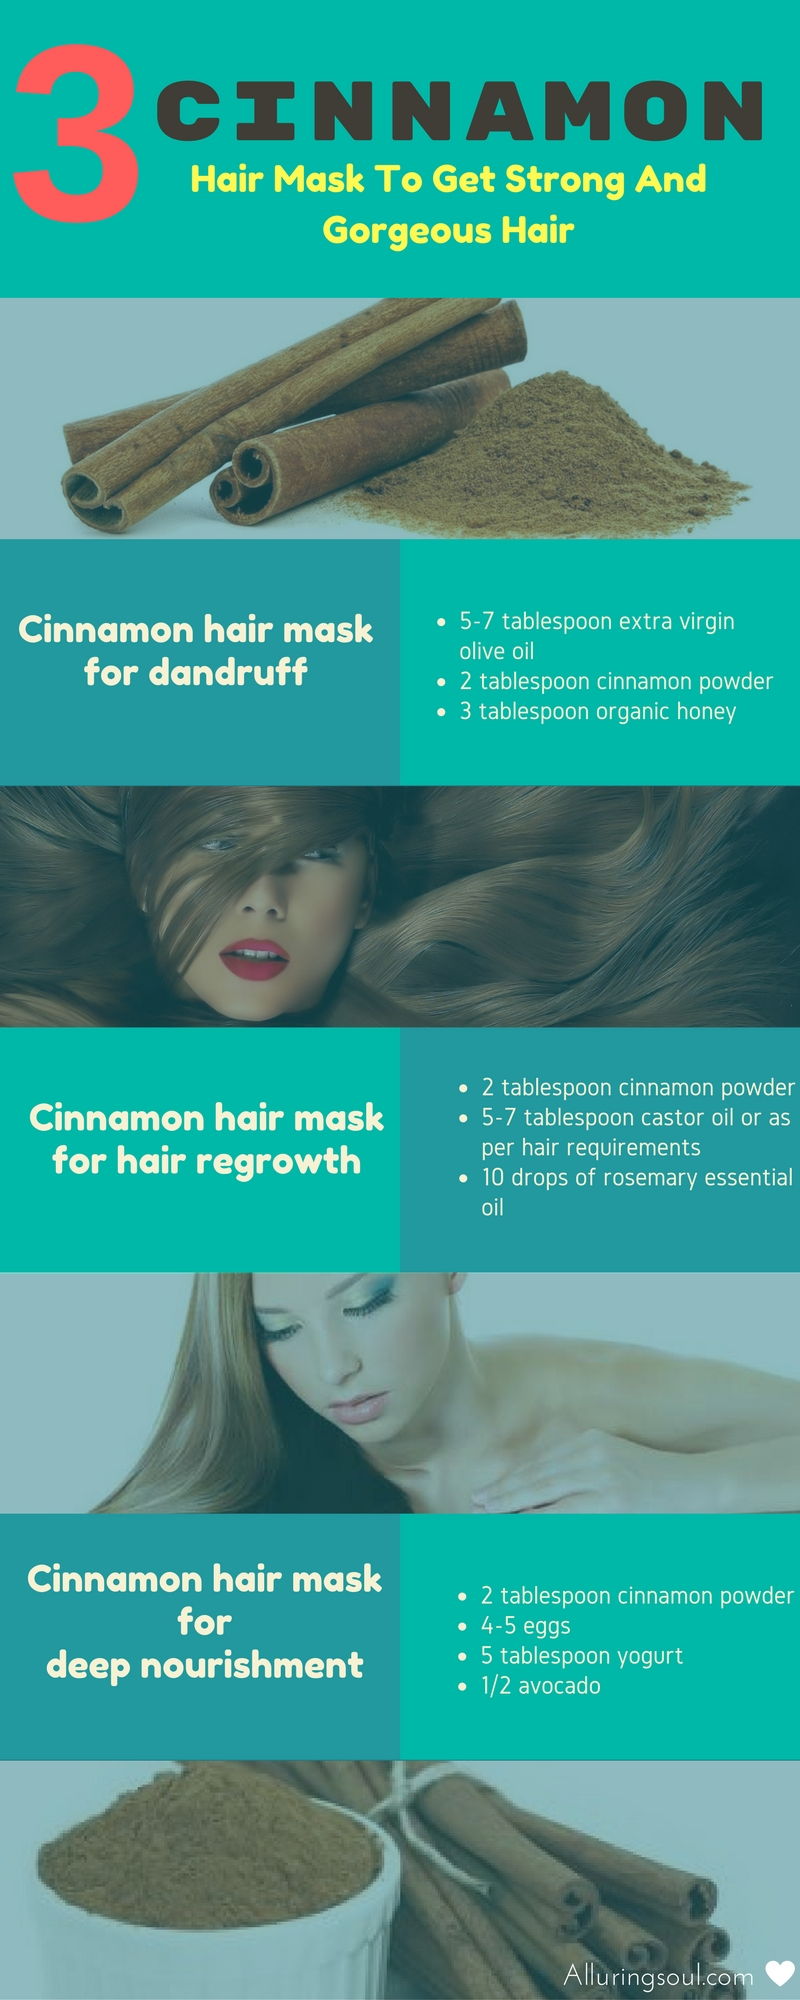 cinnamon hair mask